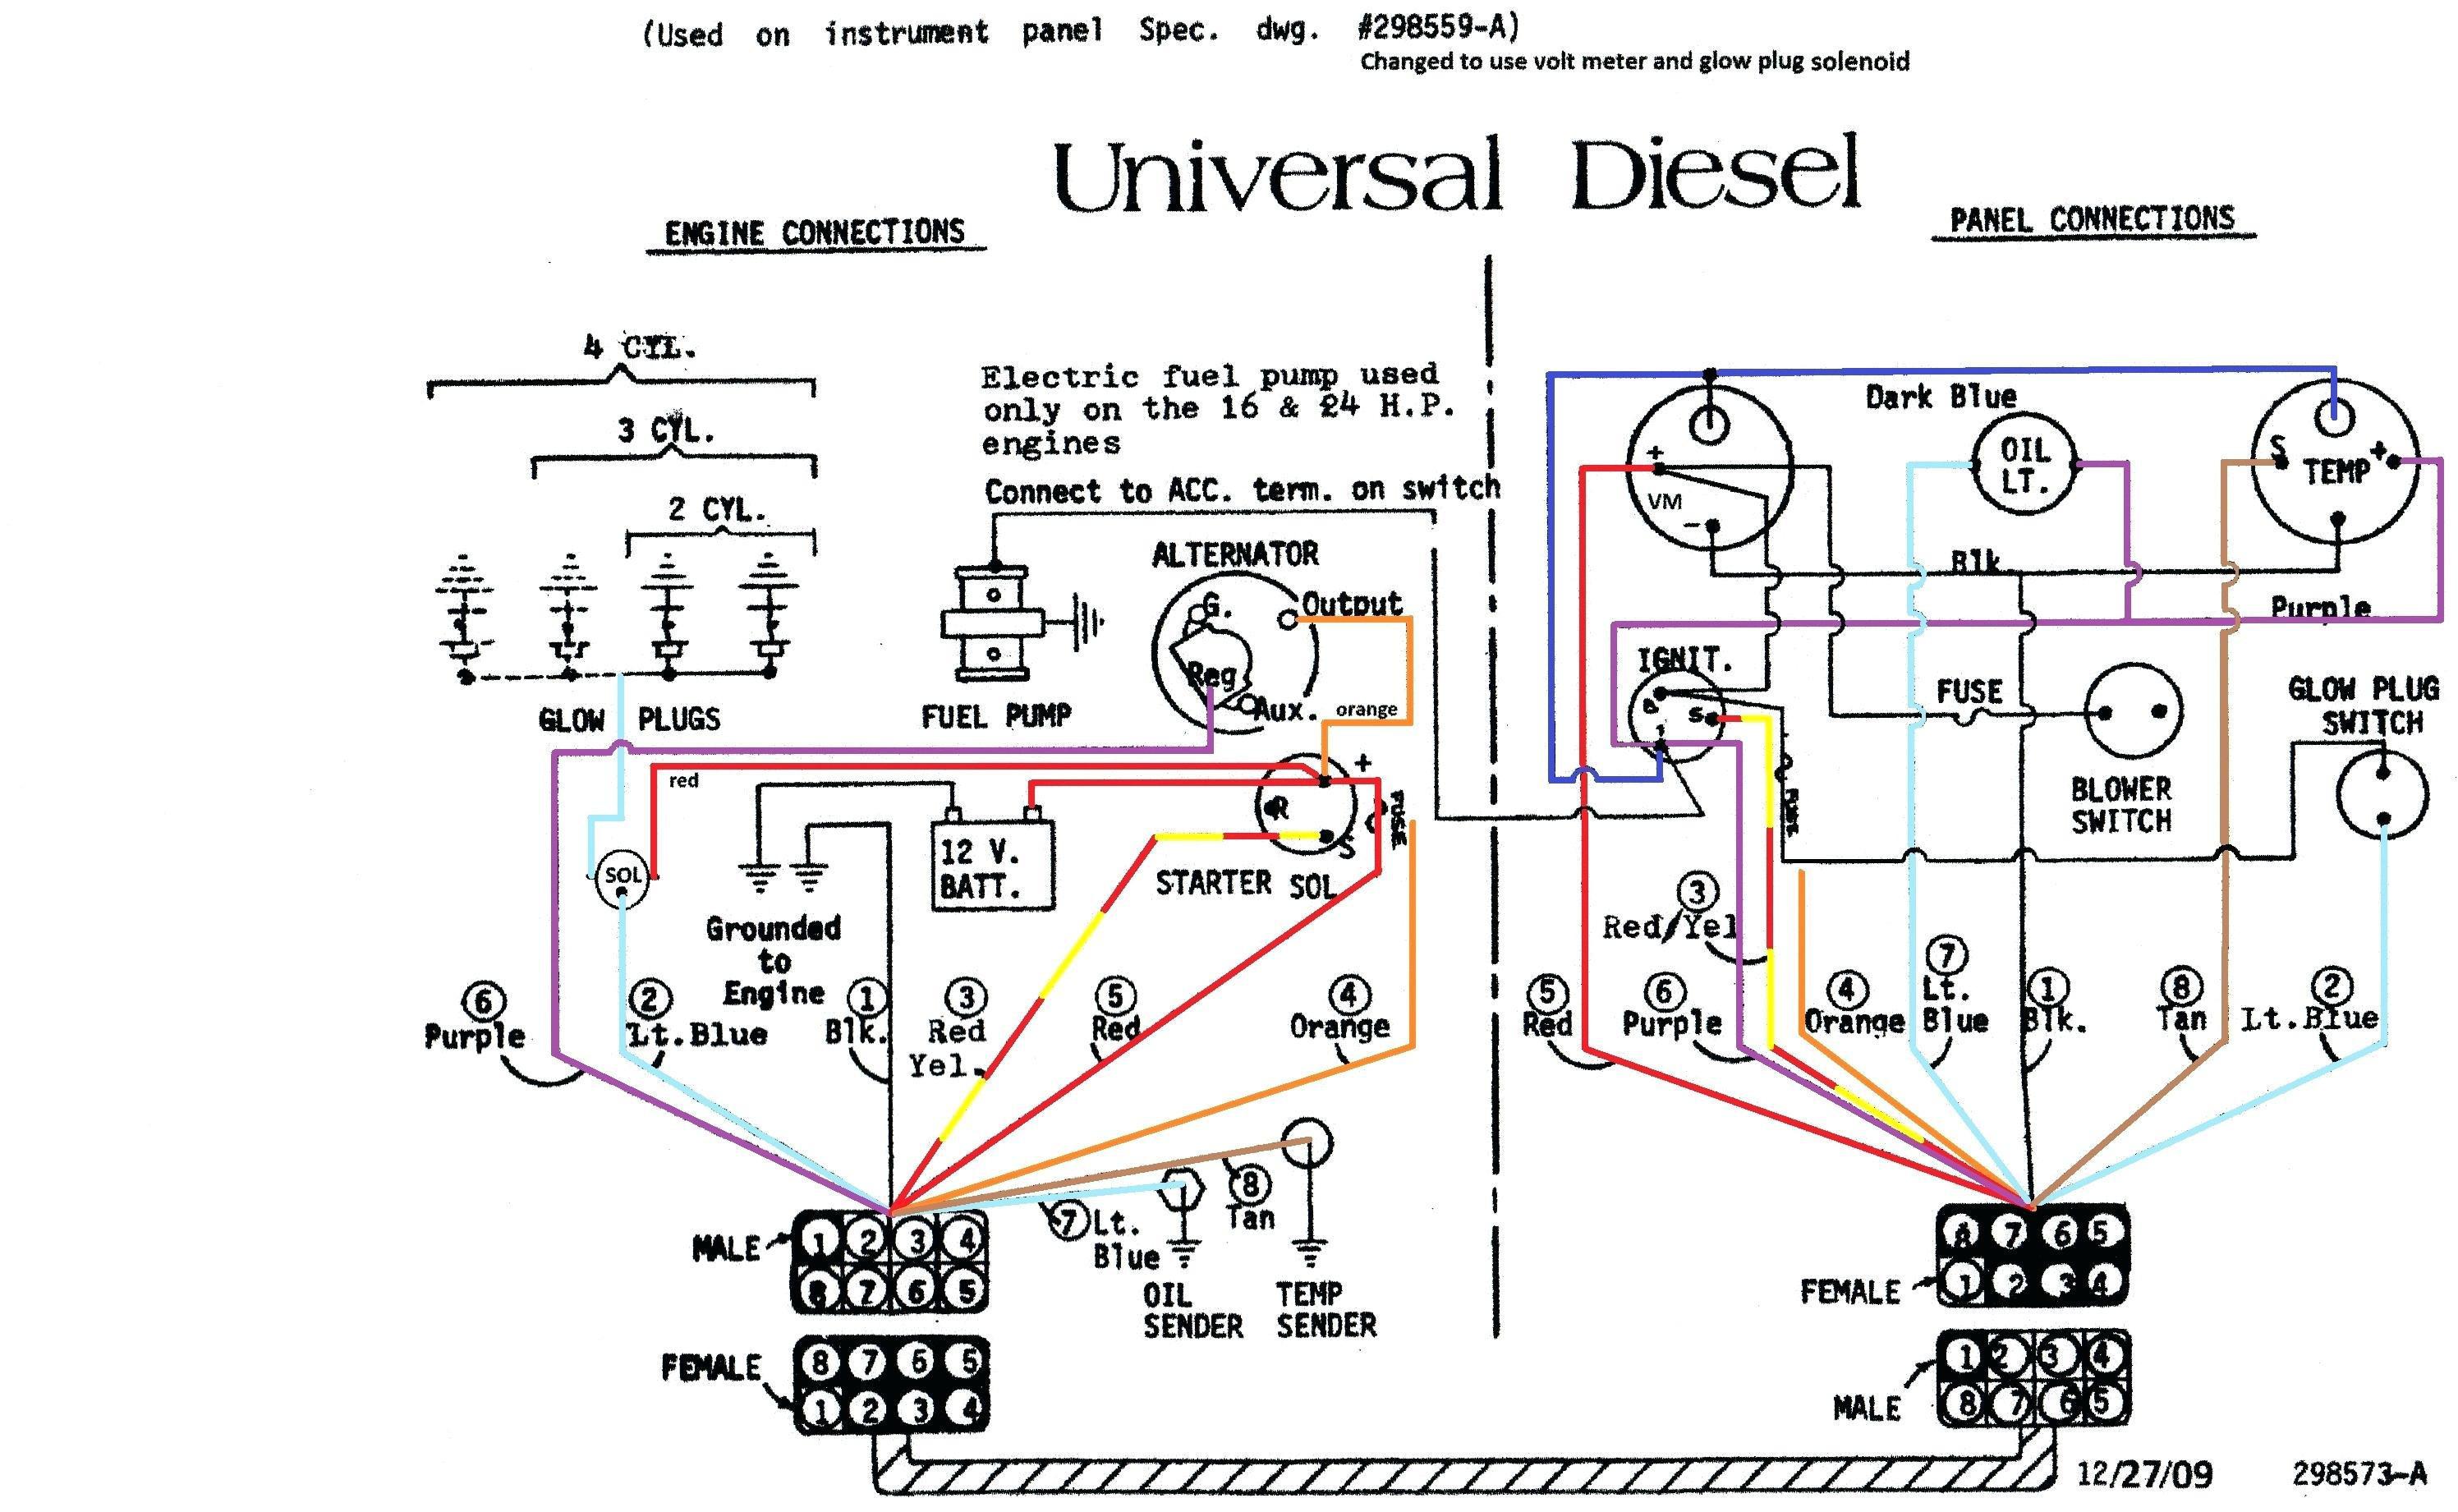 7.3 Powerstroke Glow Plug Relay Wiring Diagram Reference Of Wiring - 7.3 Powerstroke Glow Plug Relay Wiring Diagram